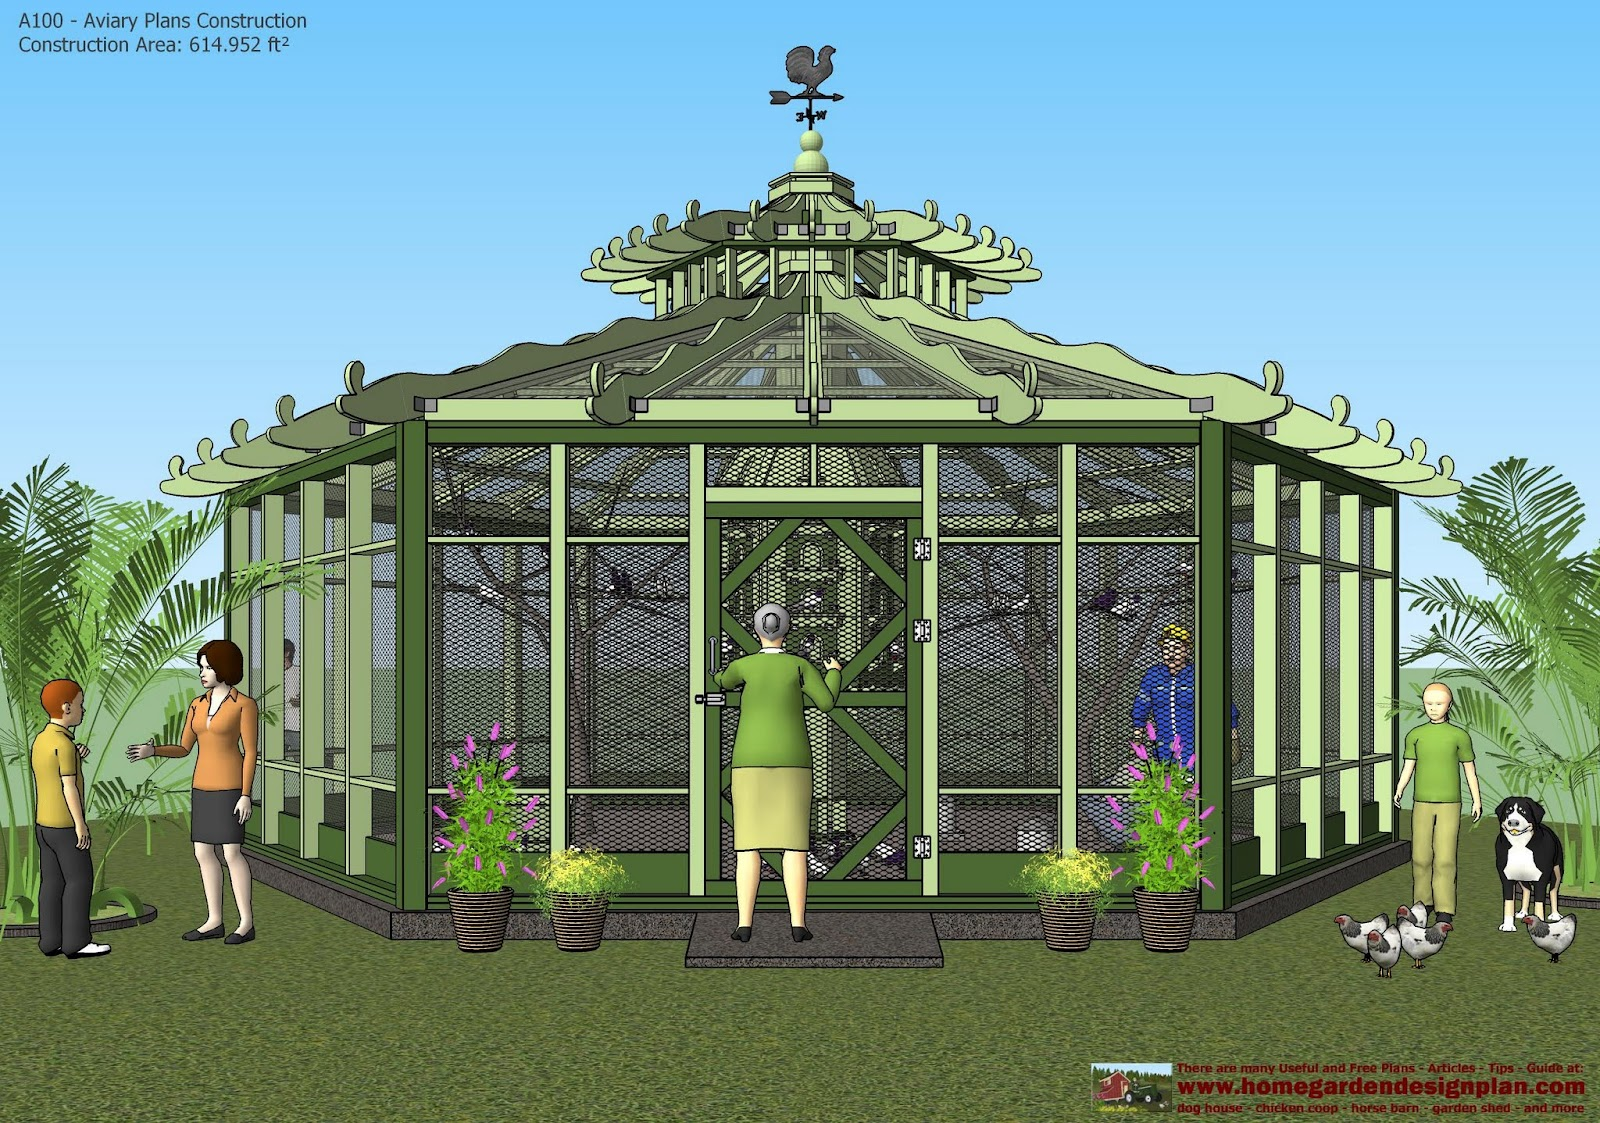 Home garden plans a100 aviary plans construction for Building a quail house